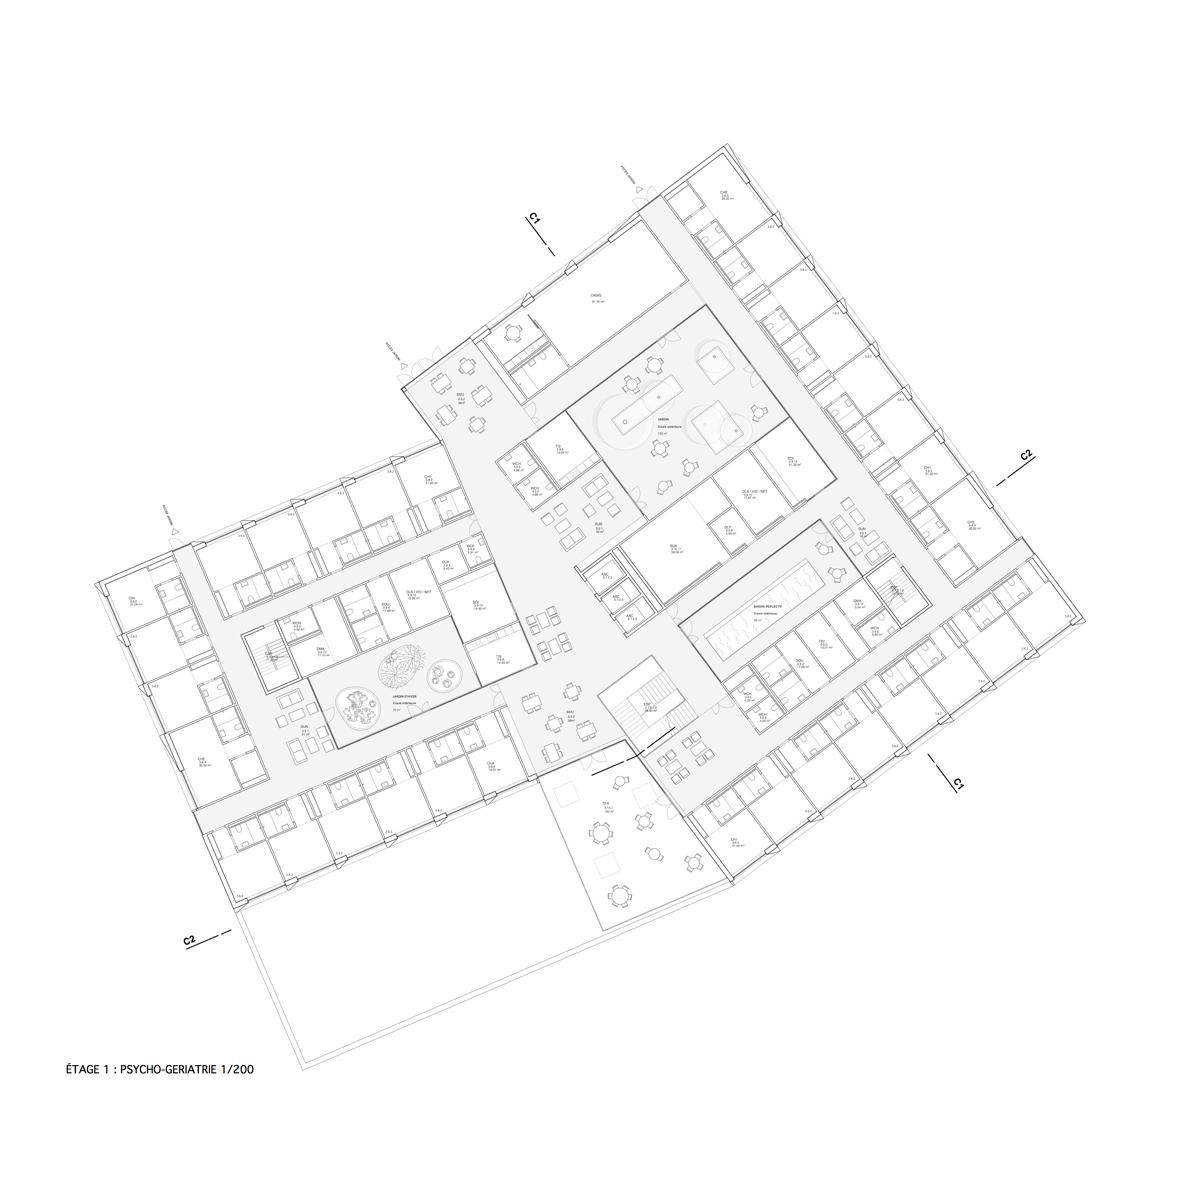 PDF_12-037_EMS_SAINT-CROIX_01.jpg